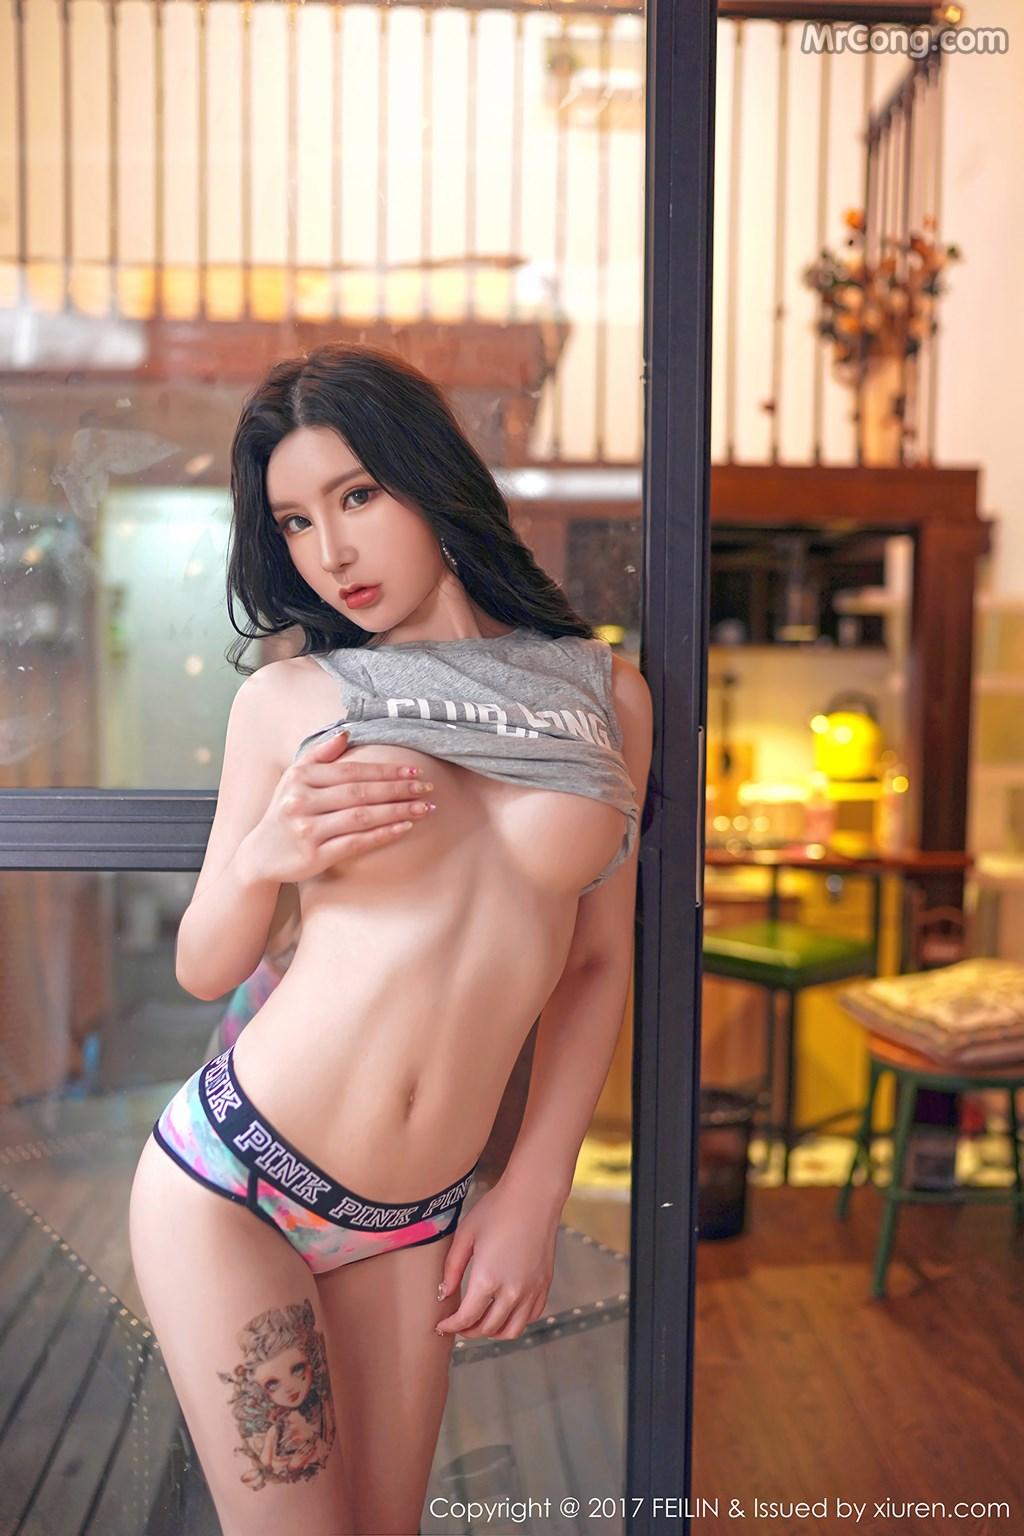 FEILIN Vol.106: Model Zhou Yuxi (周 于 希 dummy) (43 pictures)